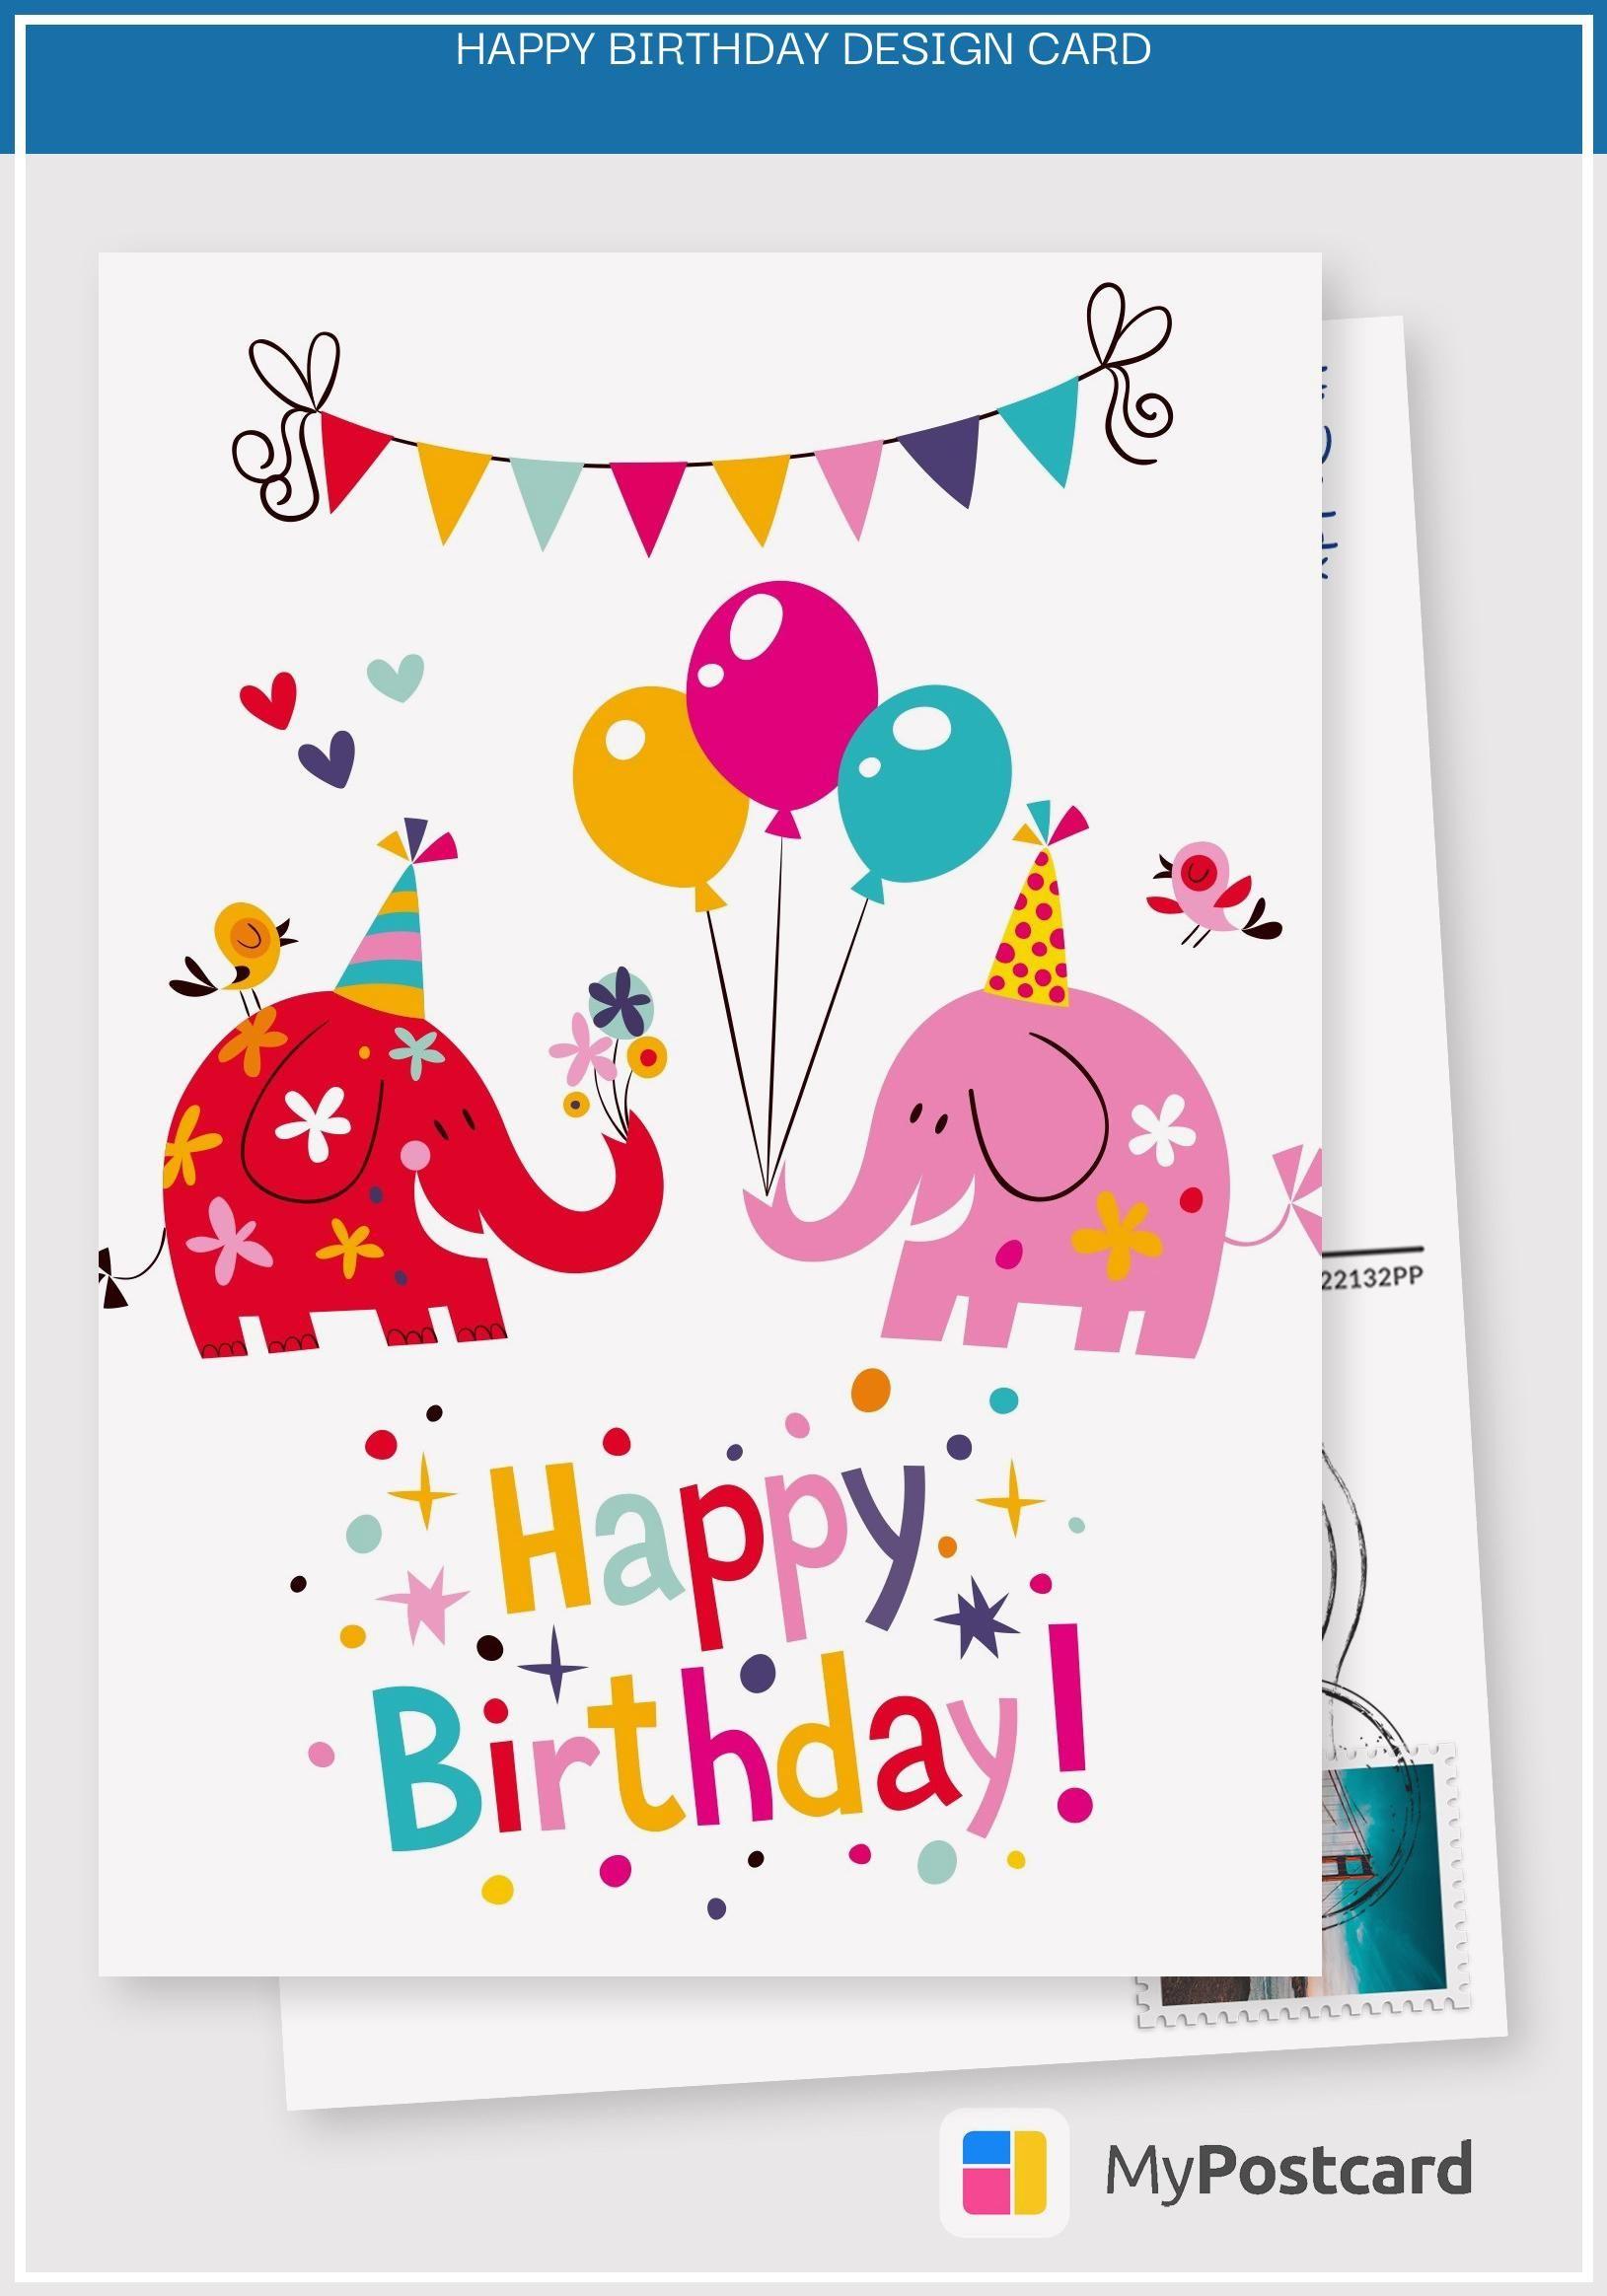 13 Large Happy Birthday Design Card Birthday Cards Images Happy Birthday Design Happy Birthday Cards